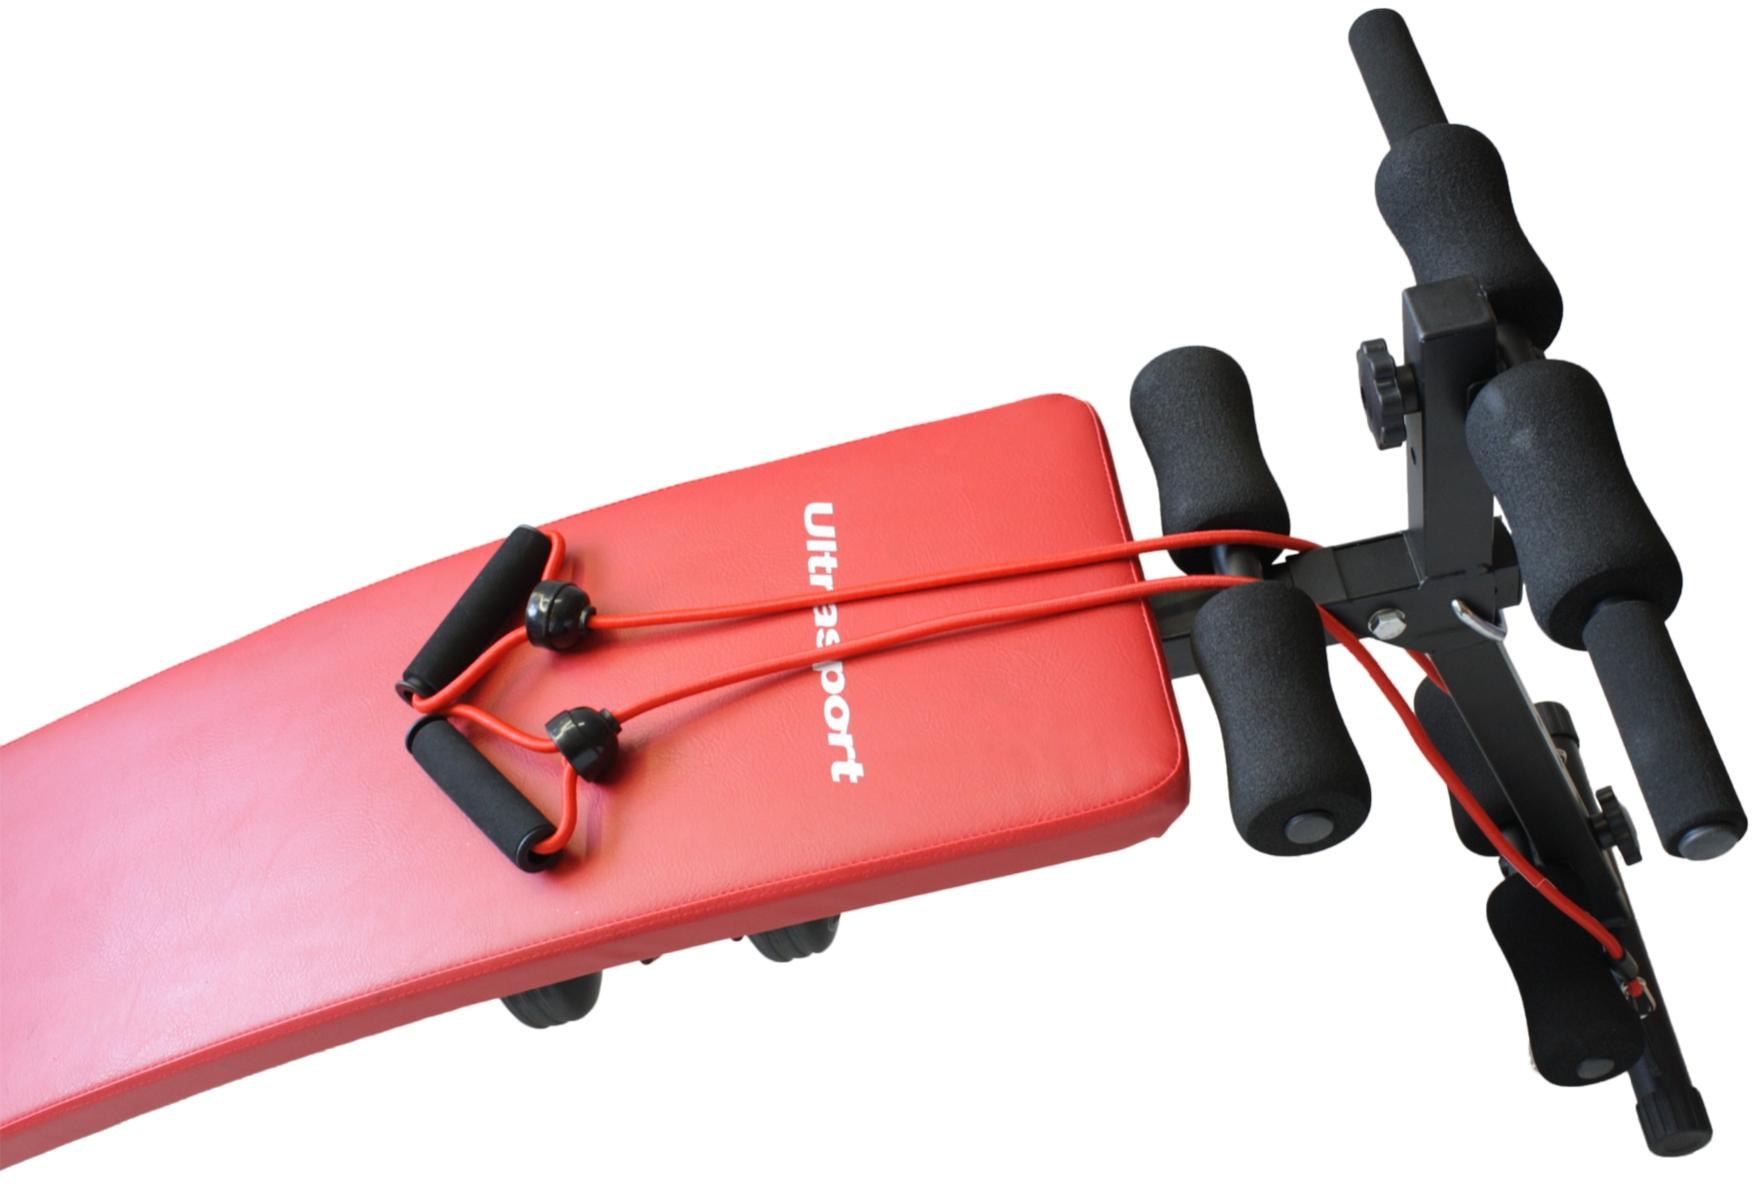 york fitness bench assembly instructions